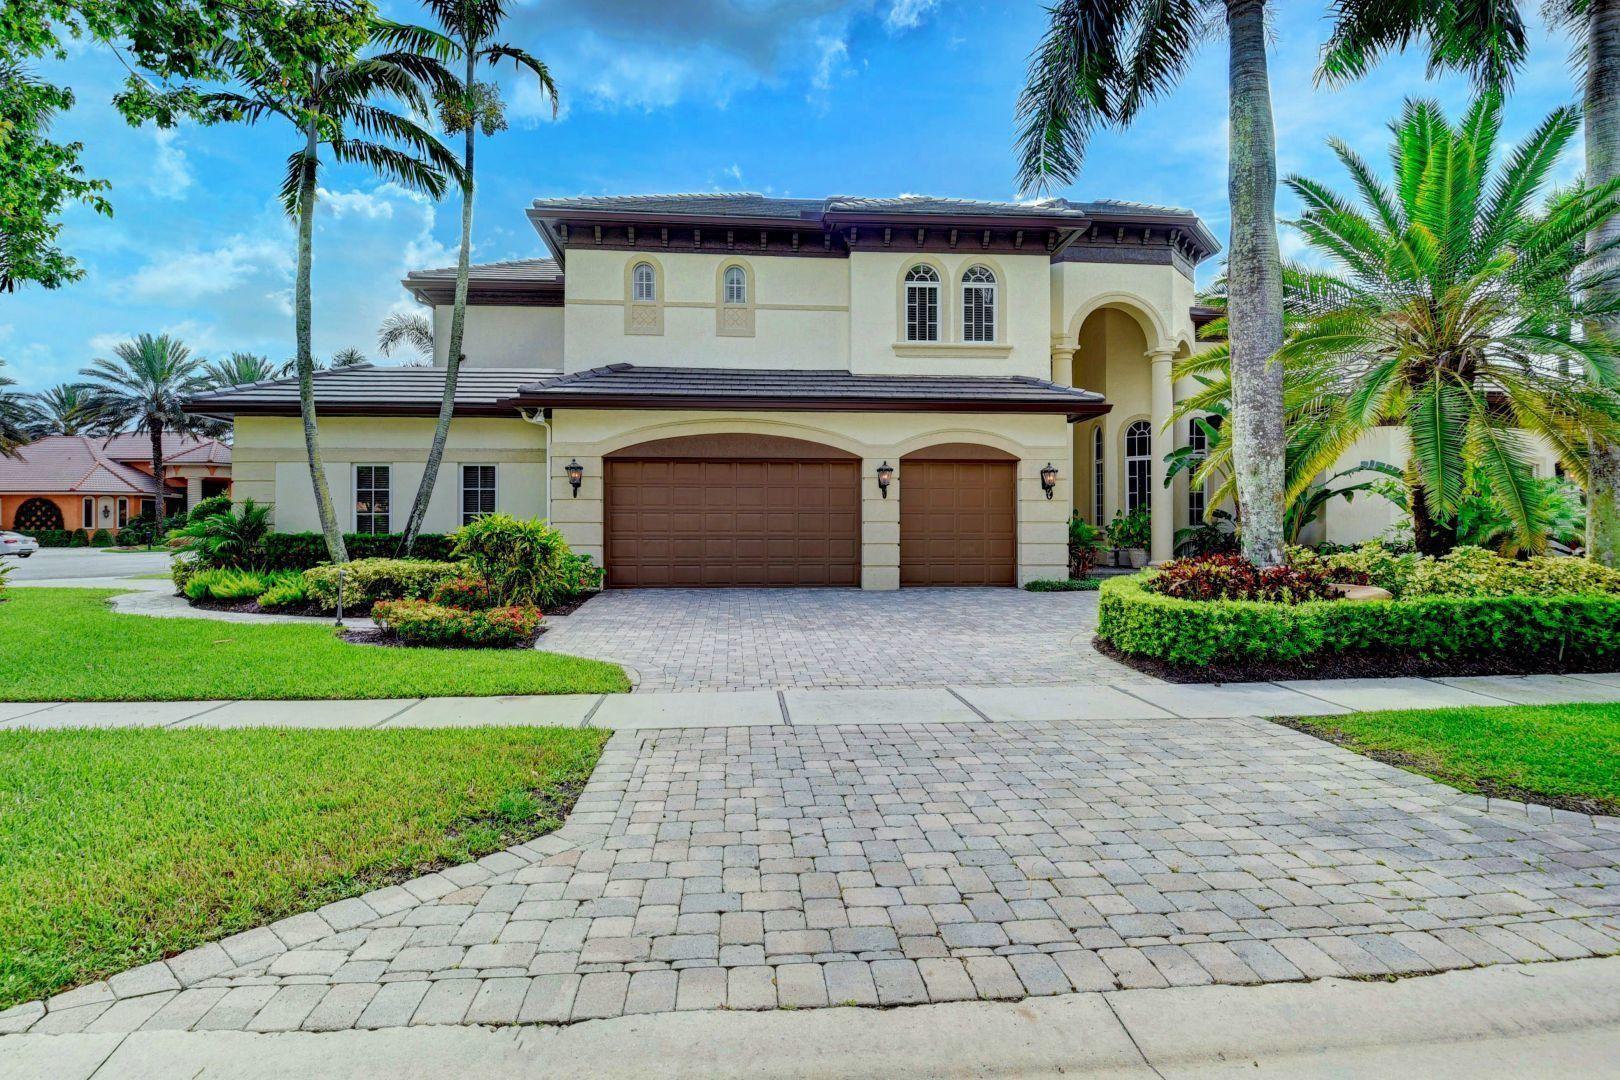 5778 Paddington Way, Boca Raton, FL 33496 - #: RX-10636622